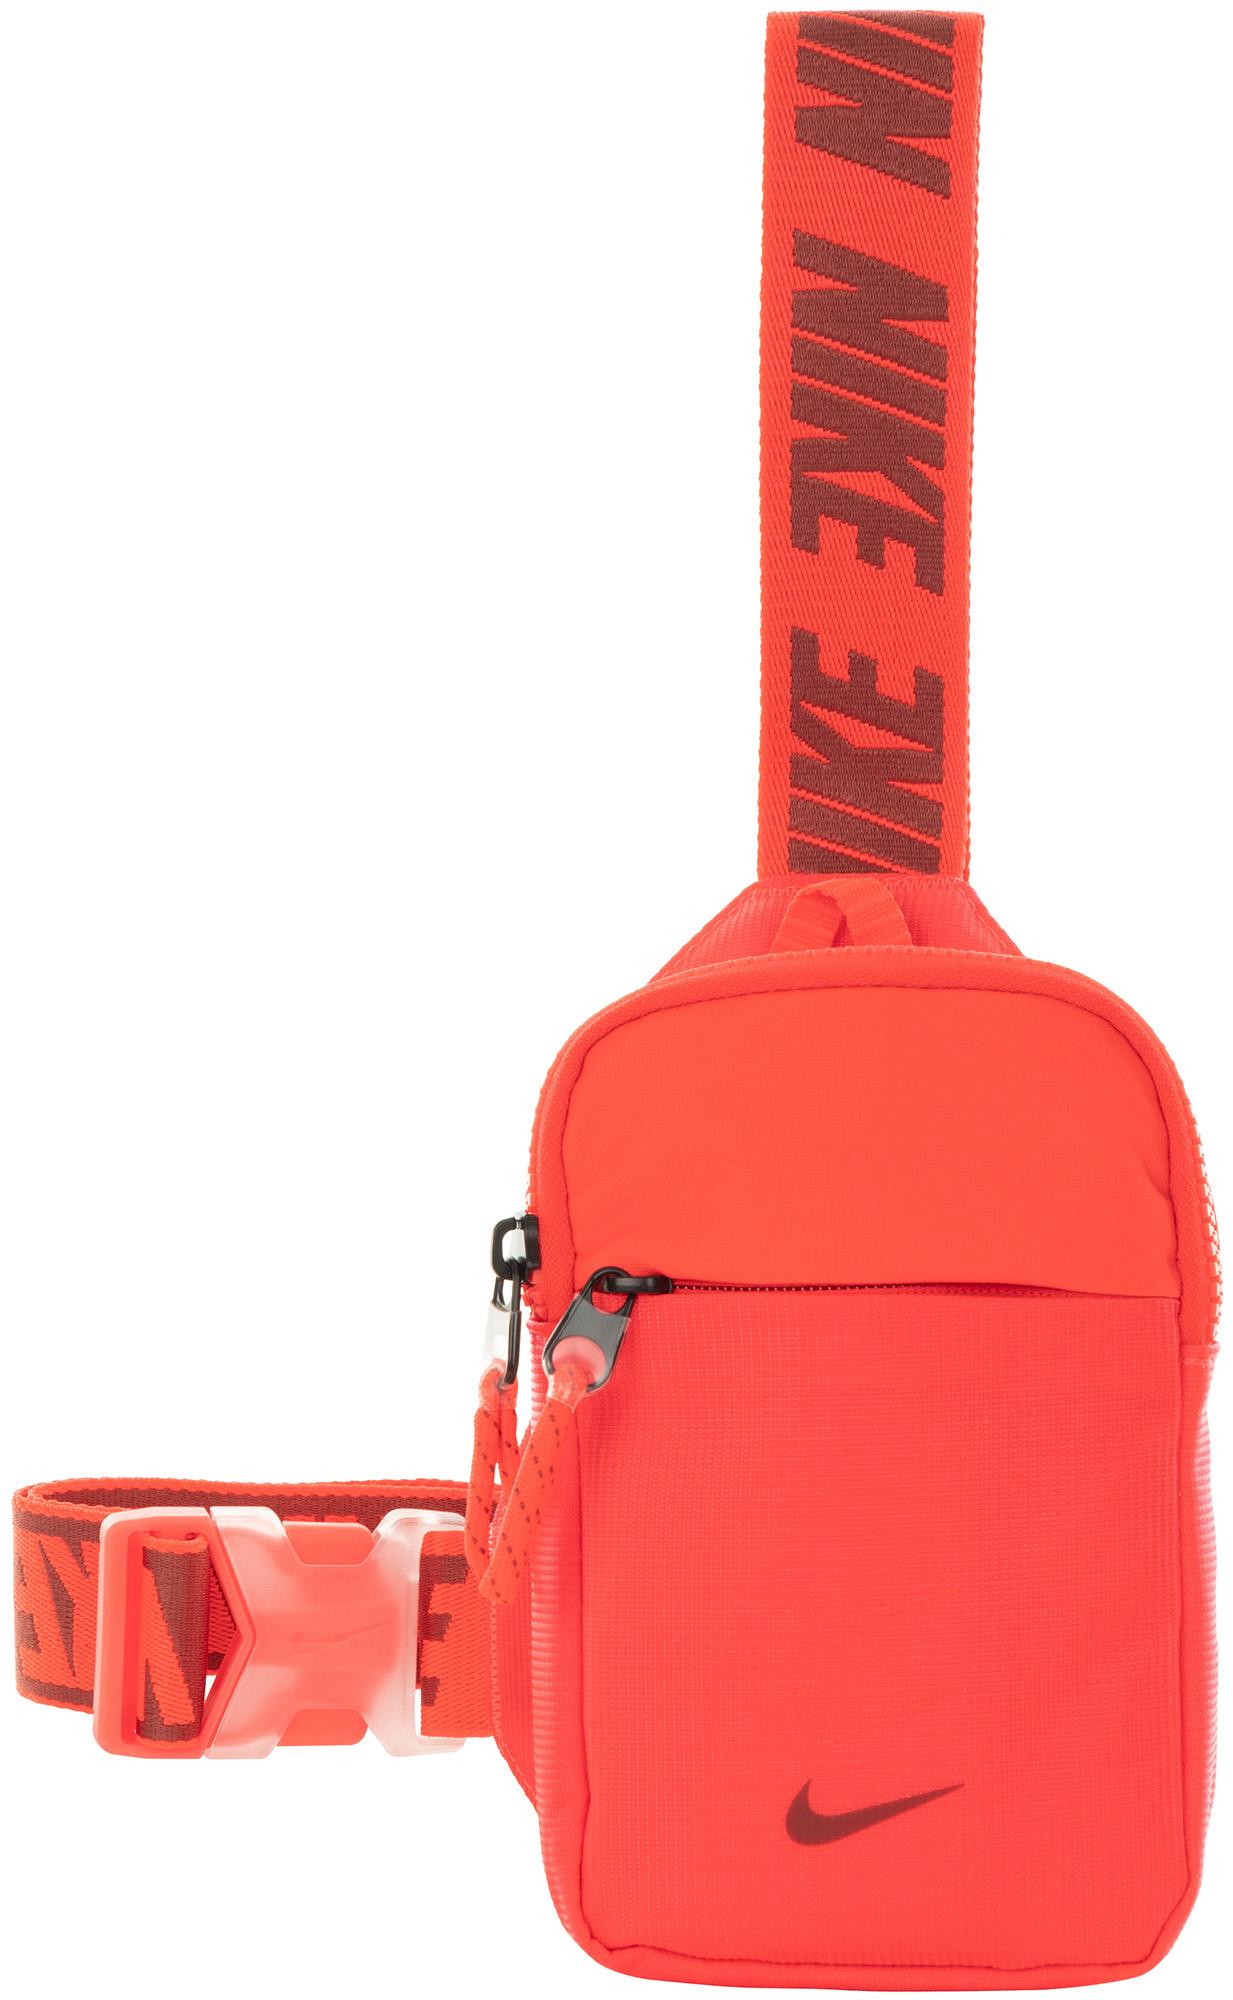 Фото - Nike Сумка Nike Sportswear Essentials сумки nike сумка alph adpt crssbdy dffl m